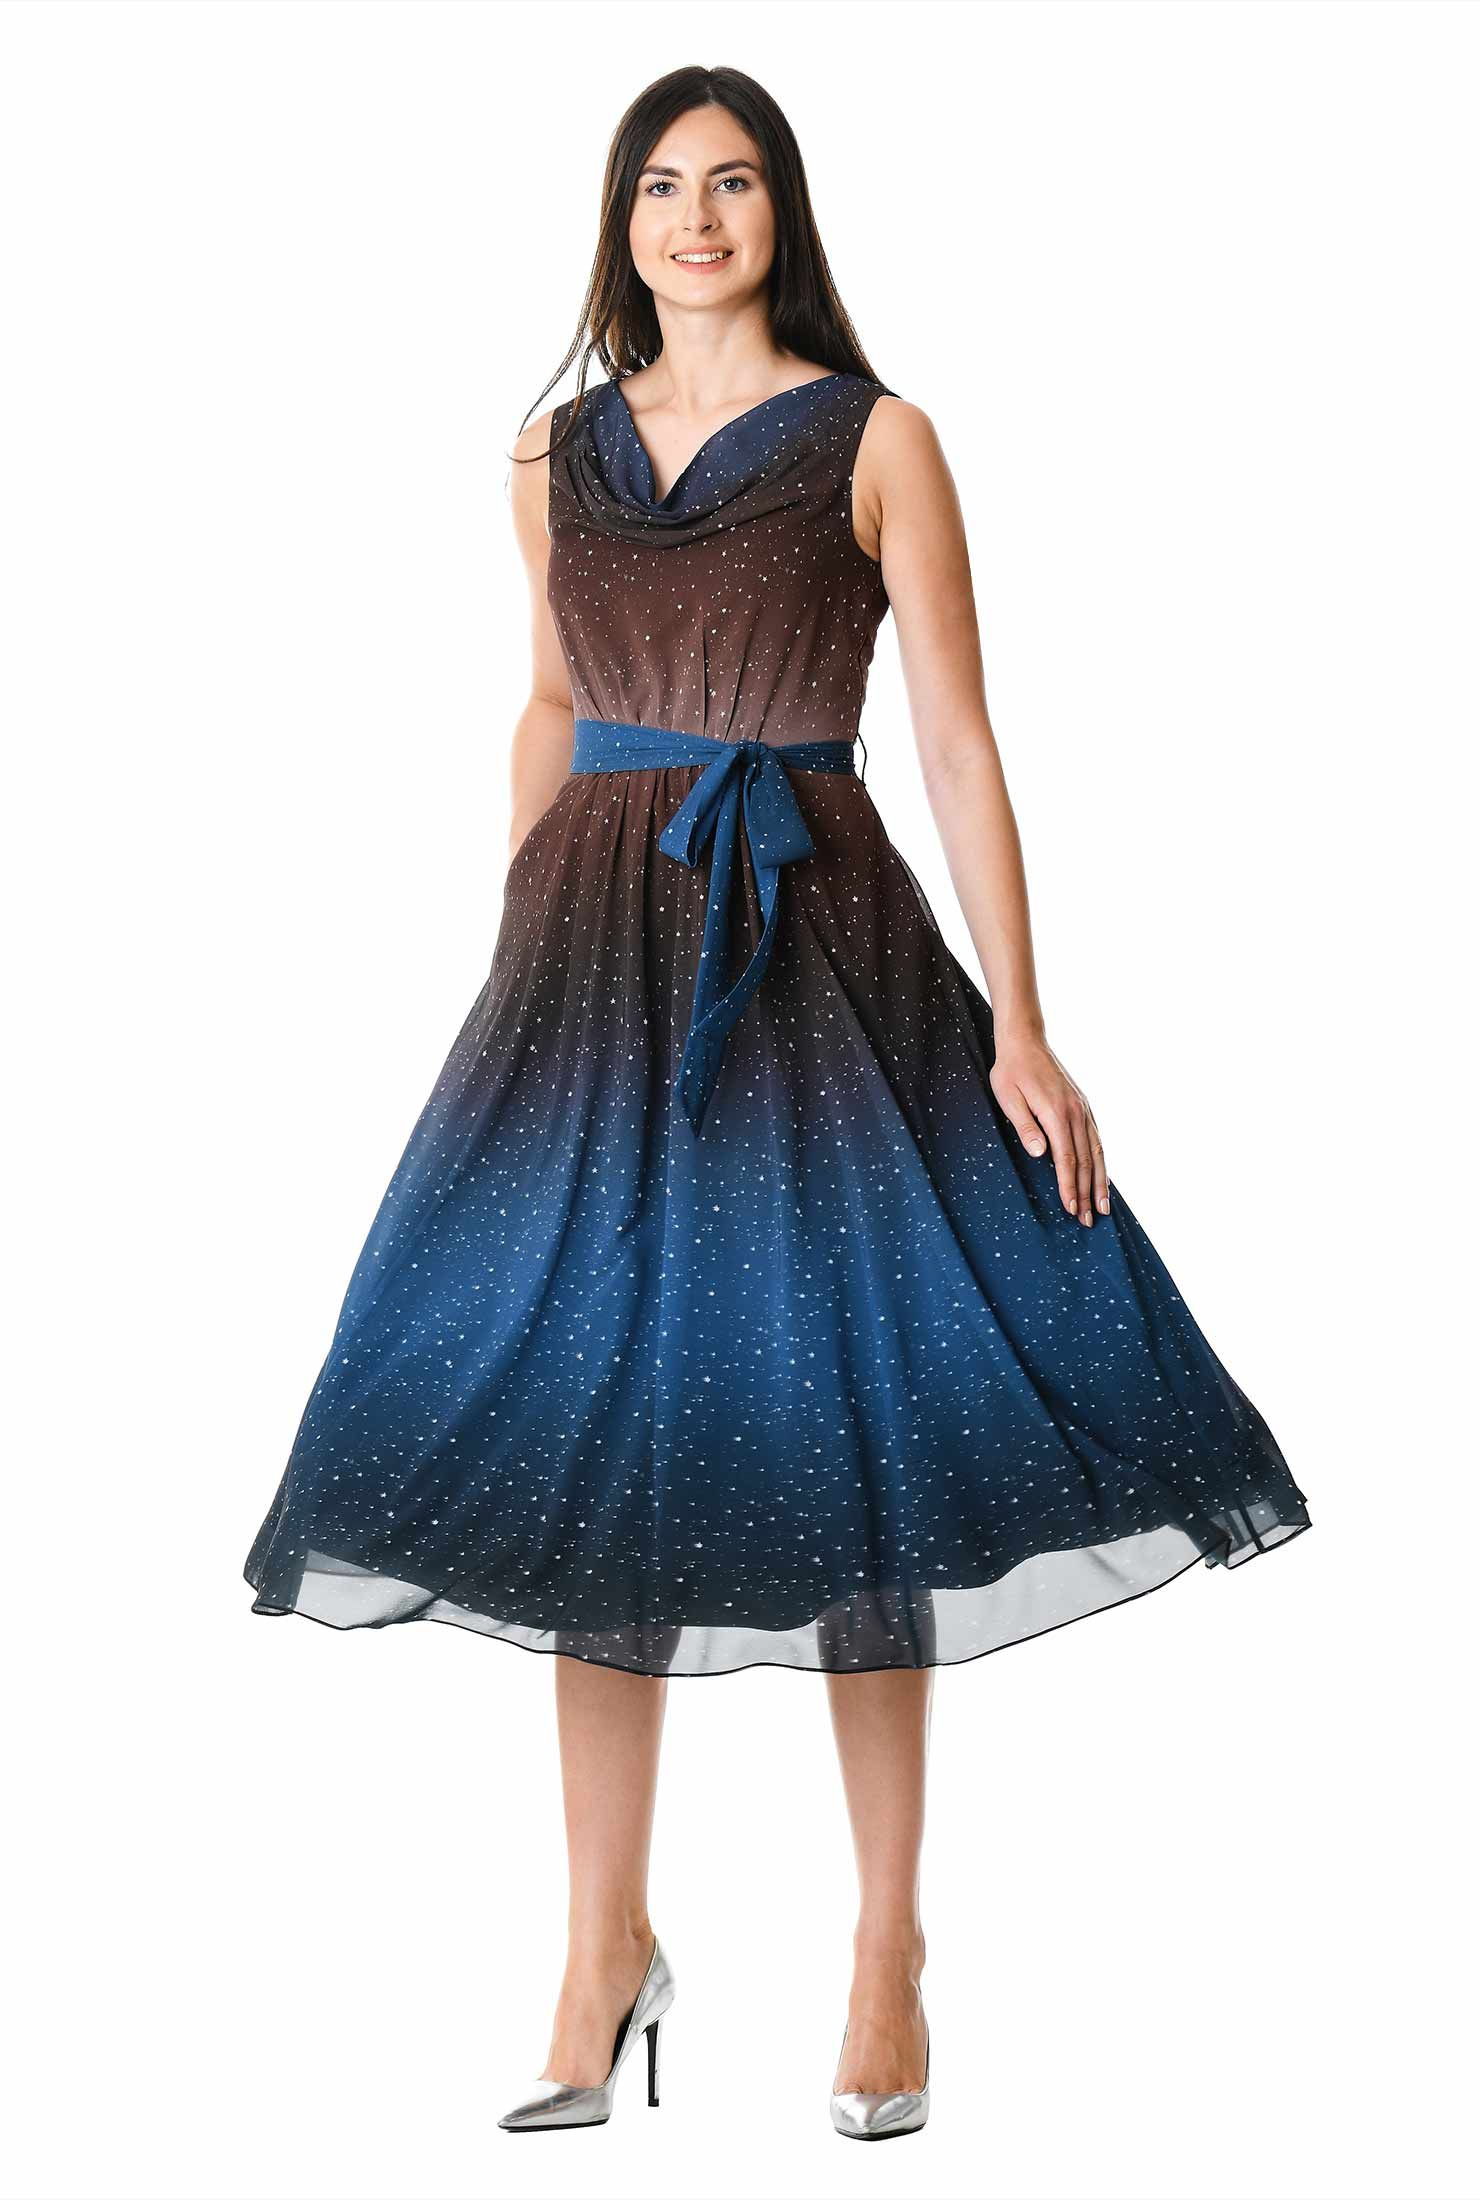 We offer cocktail prom dresses evening cocktail dresses